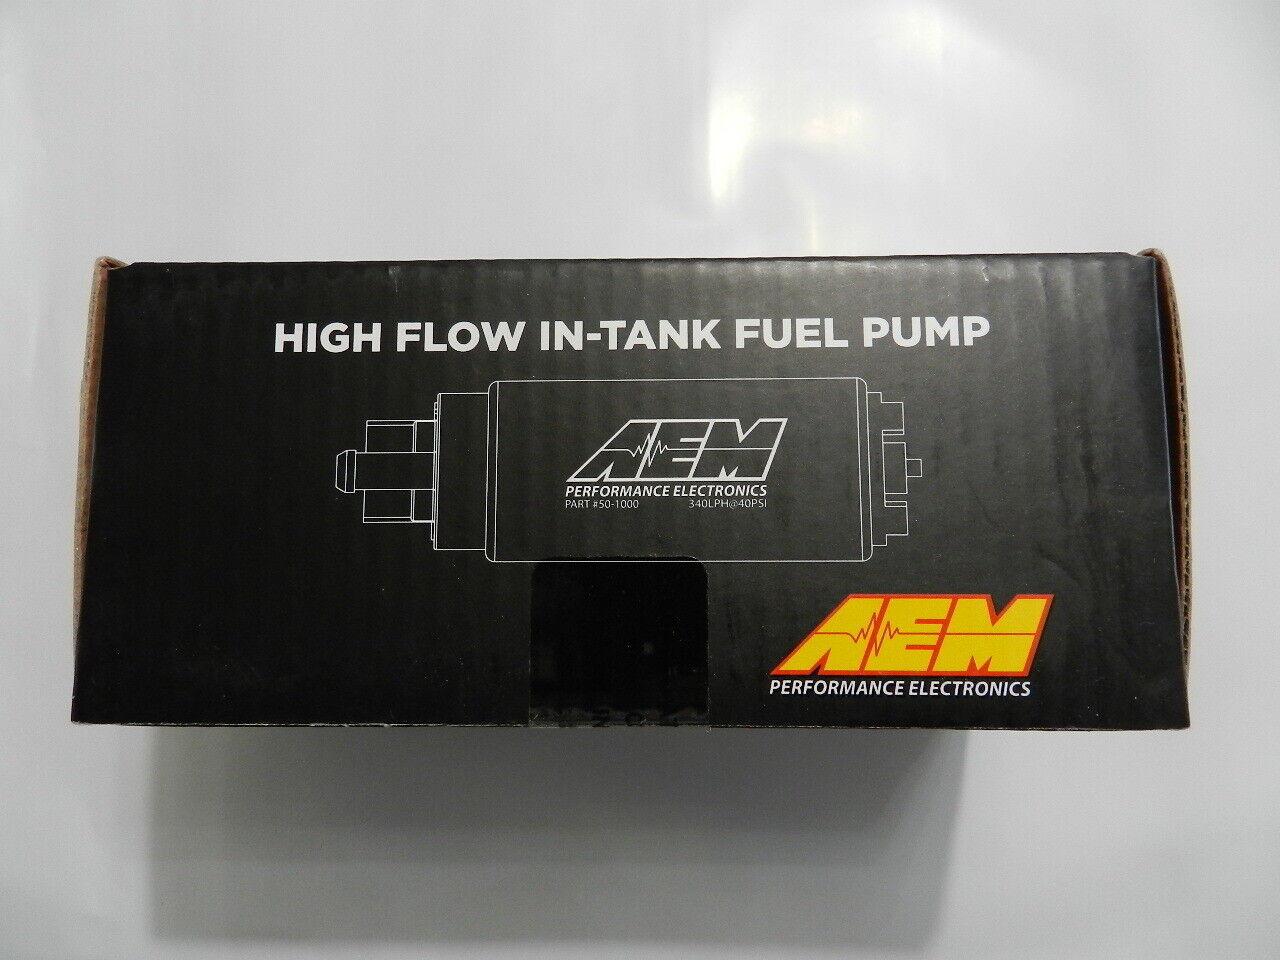 Volkswagen VDO Fuel Pump Module Assembly 228-233-001-003Z 1J0998087J New